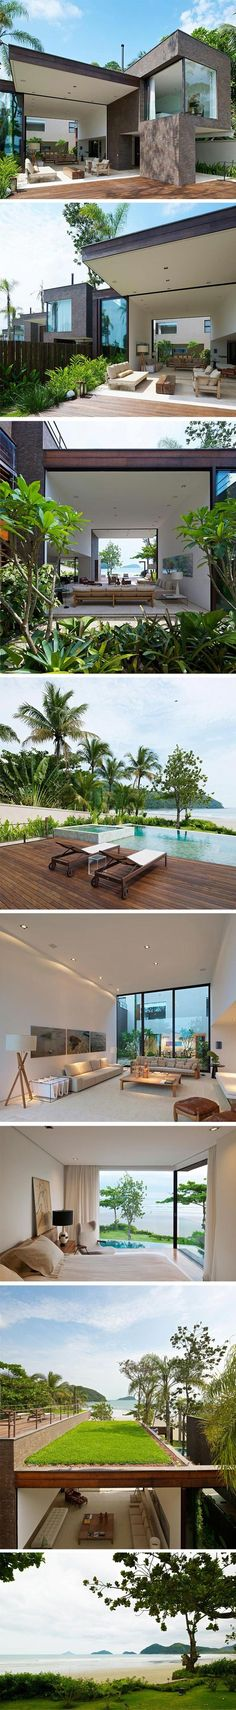 Baleia Residences by Studio Arthur Casas - Journal of Design: